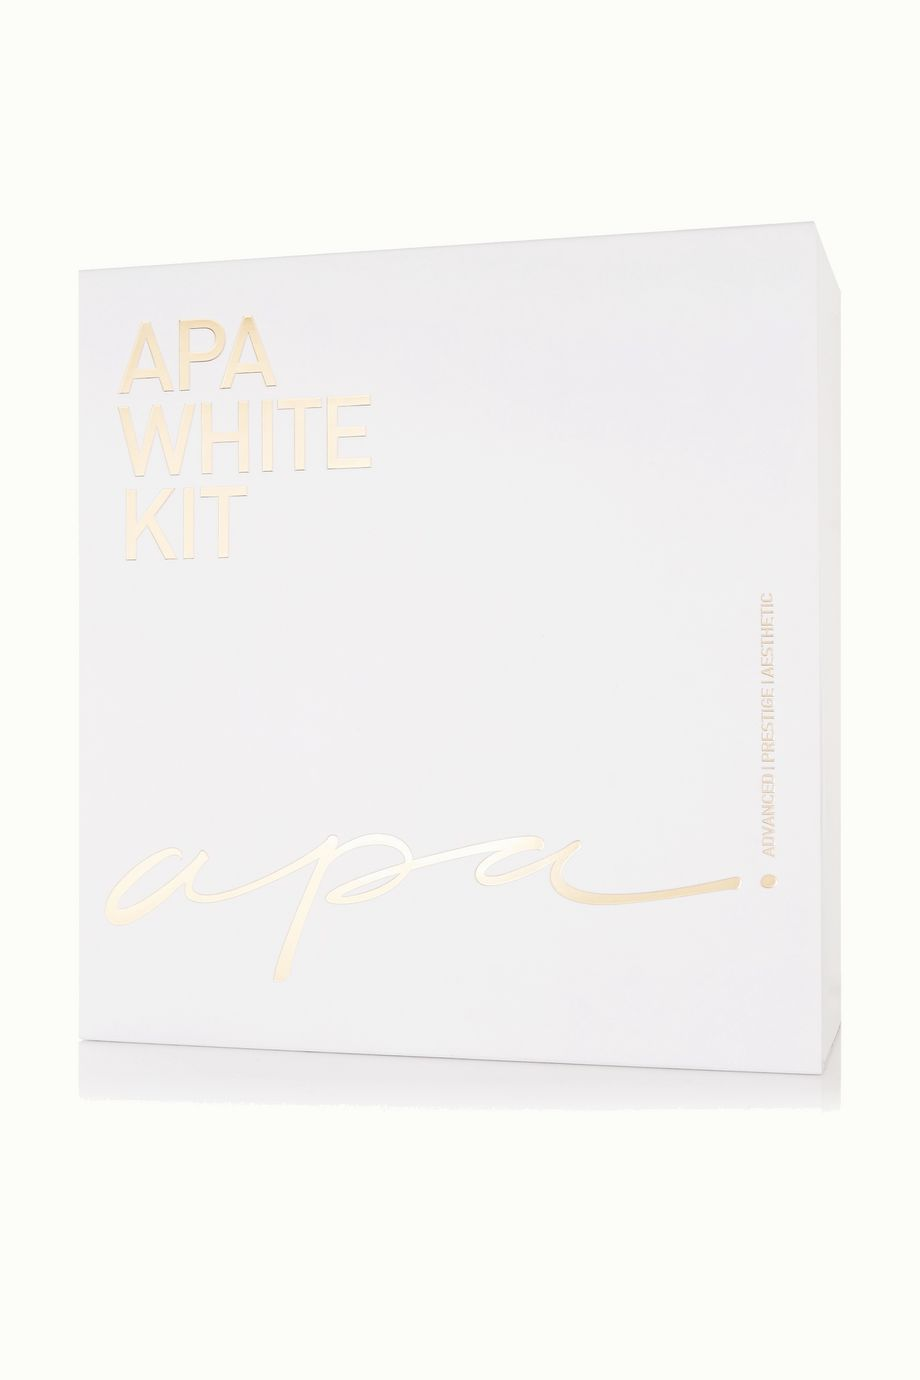 Apa Beauty + Jonathan Adler Apa White Kit